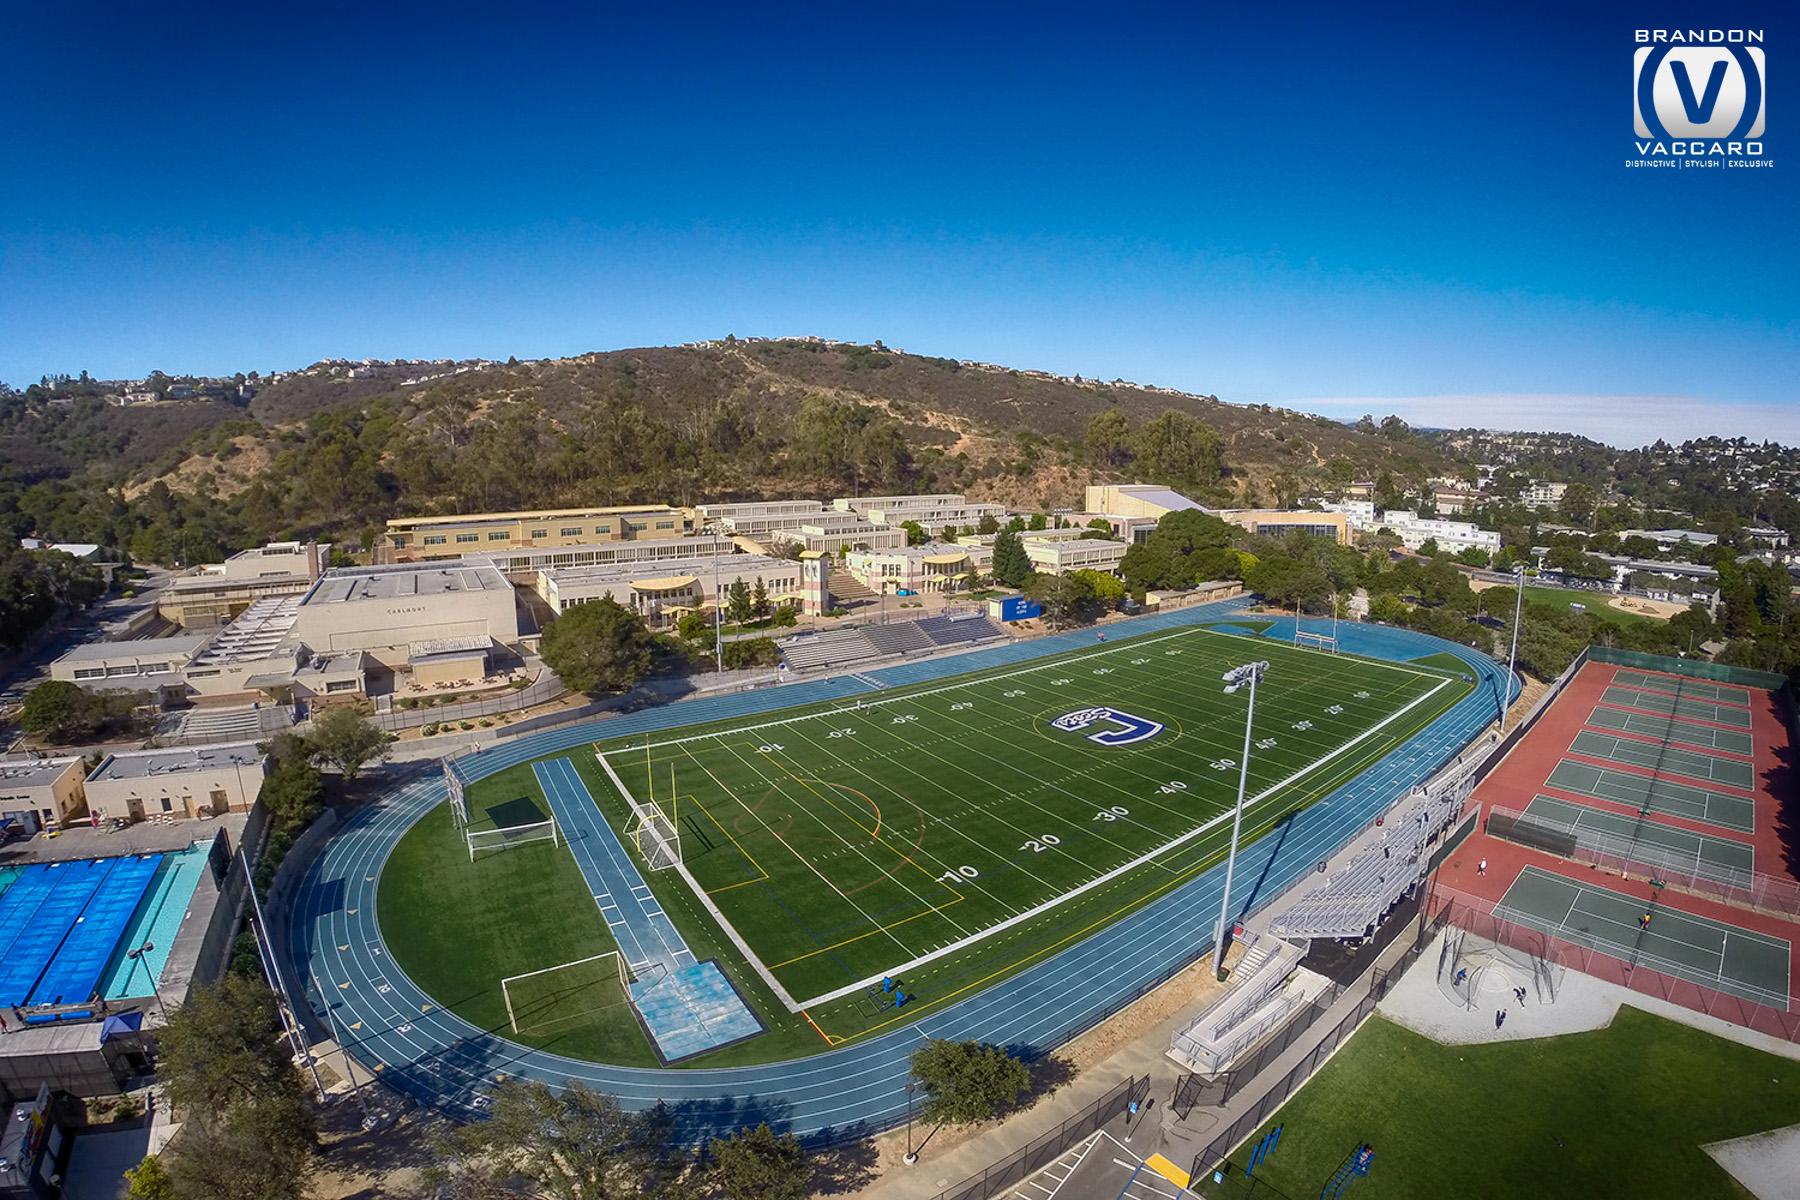 carlmont-high-school-aerial-2014.jpg